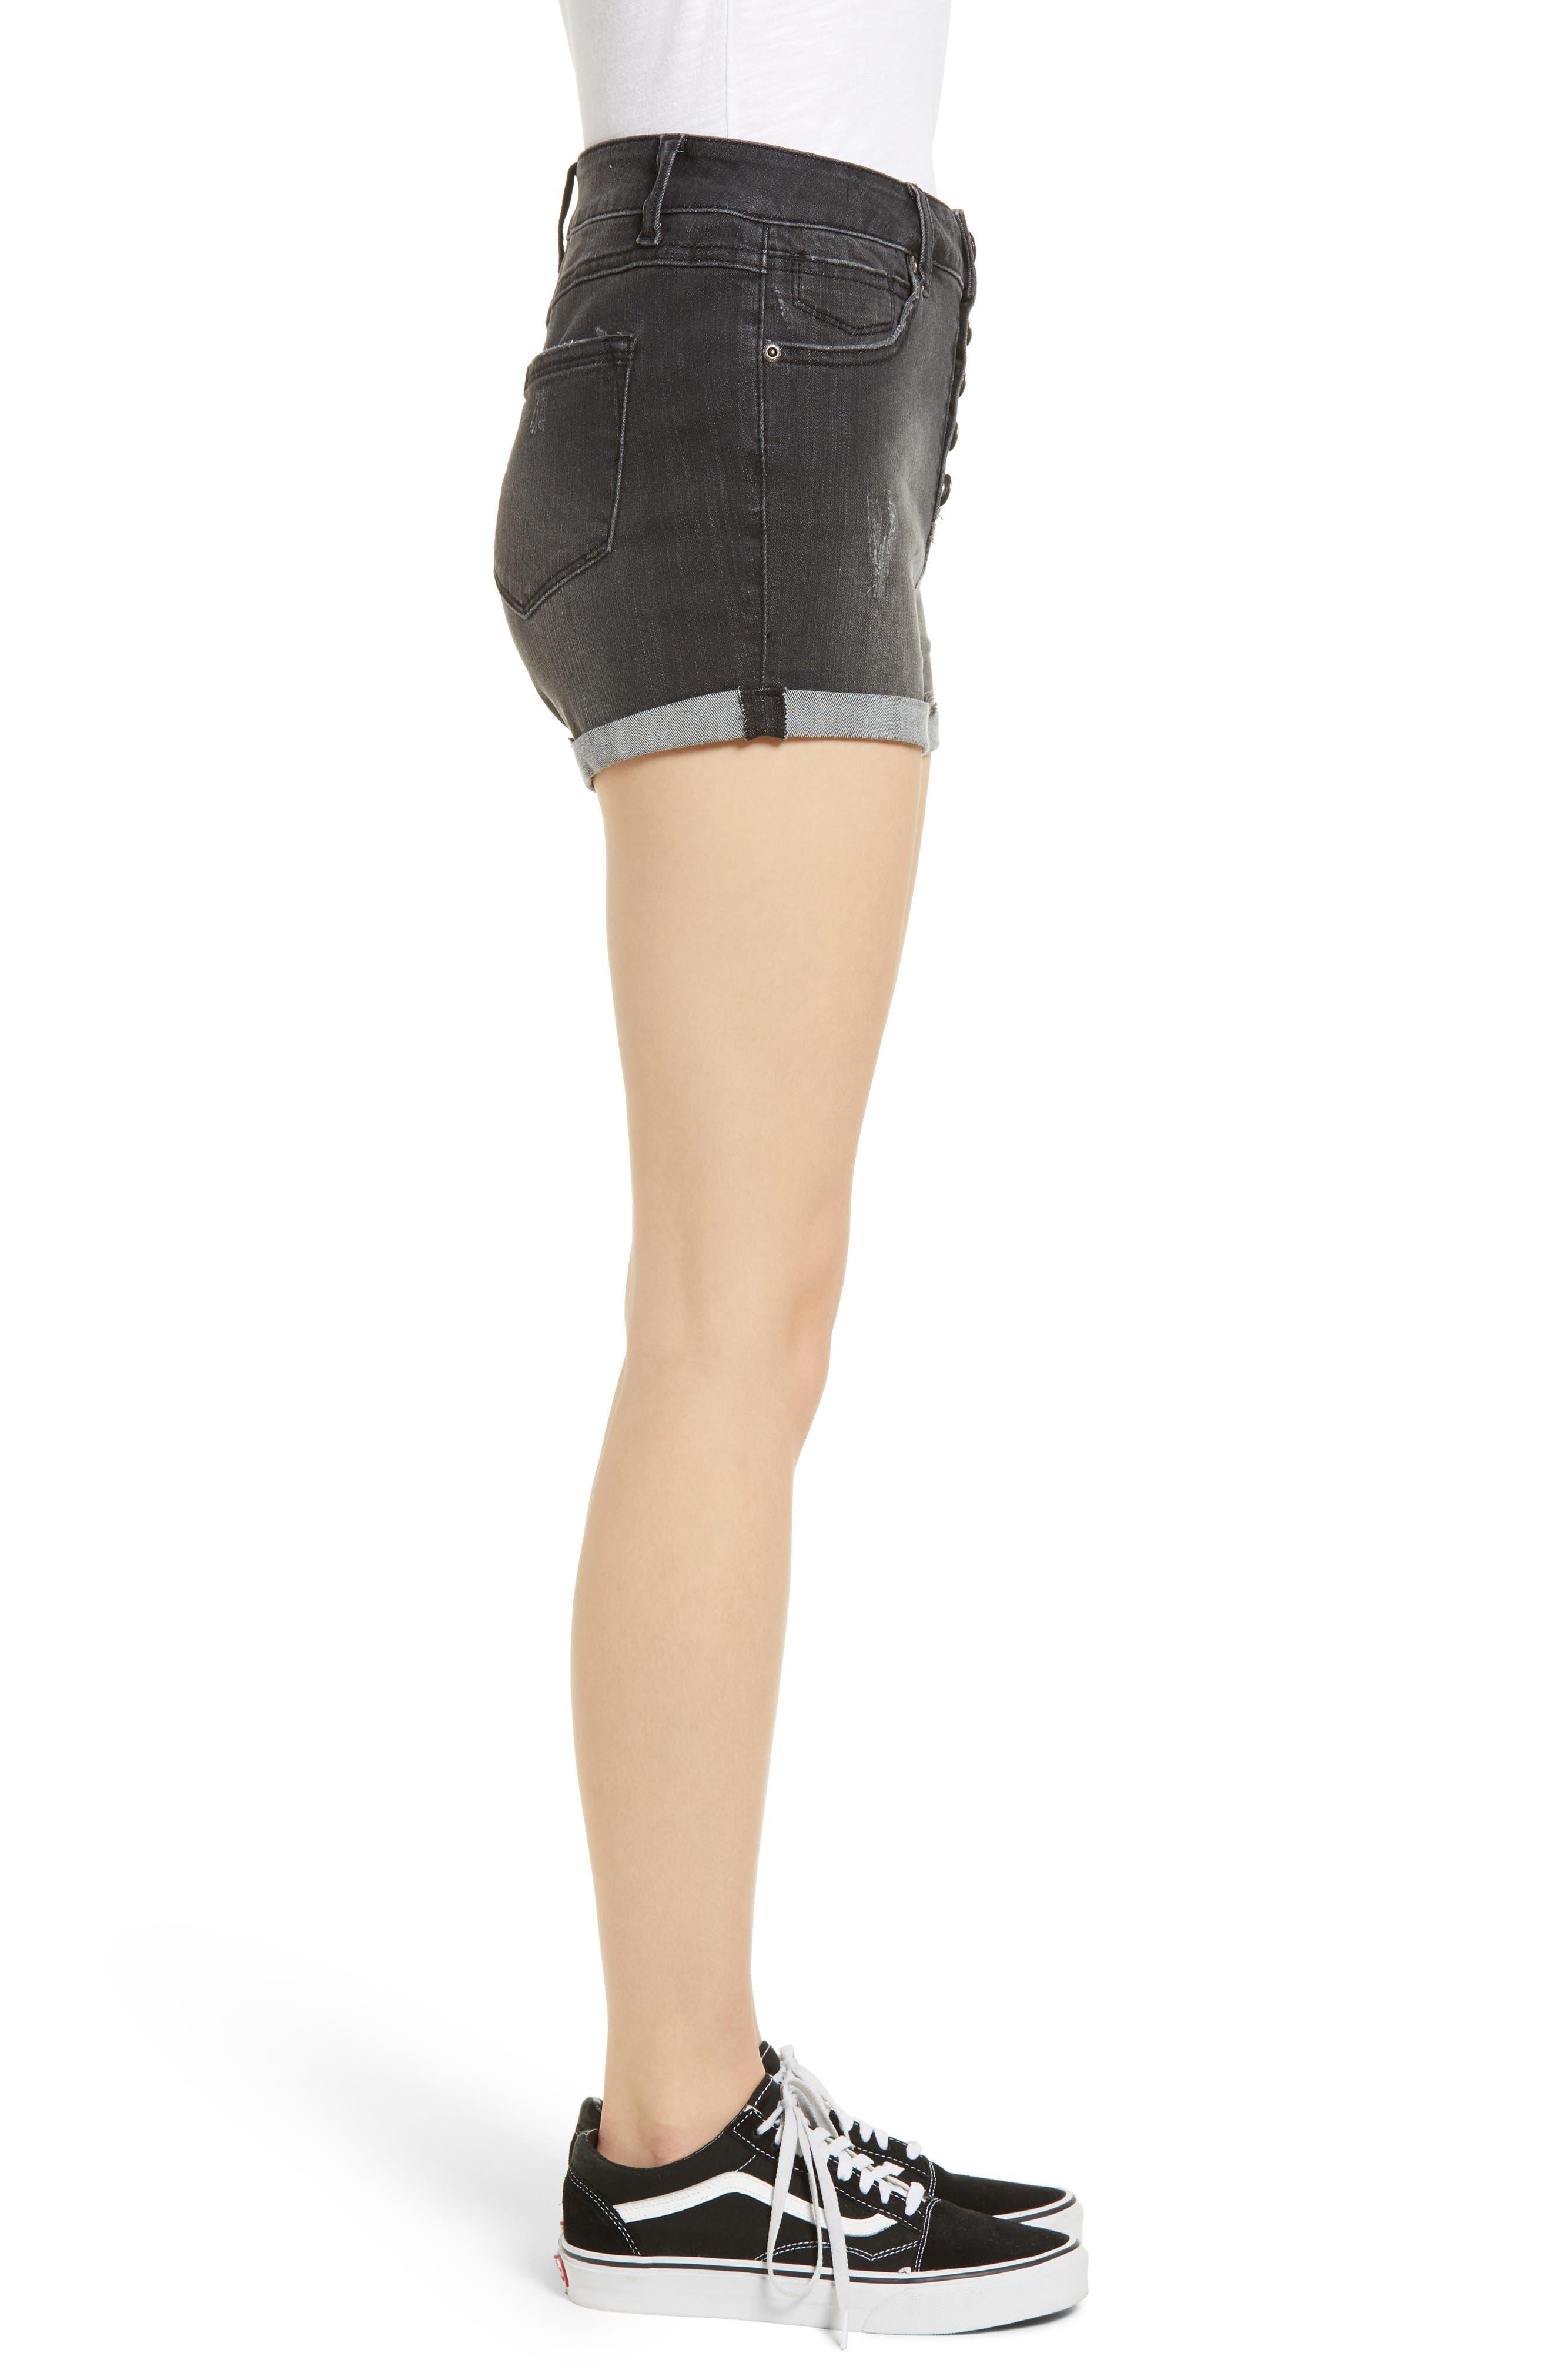 1822 DENIM,                             Cuffed Button Fly Denim Shorts,                             Alternate thumbnail 3, color,                             400